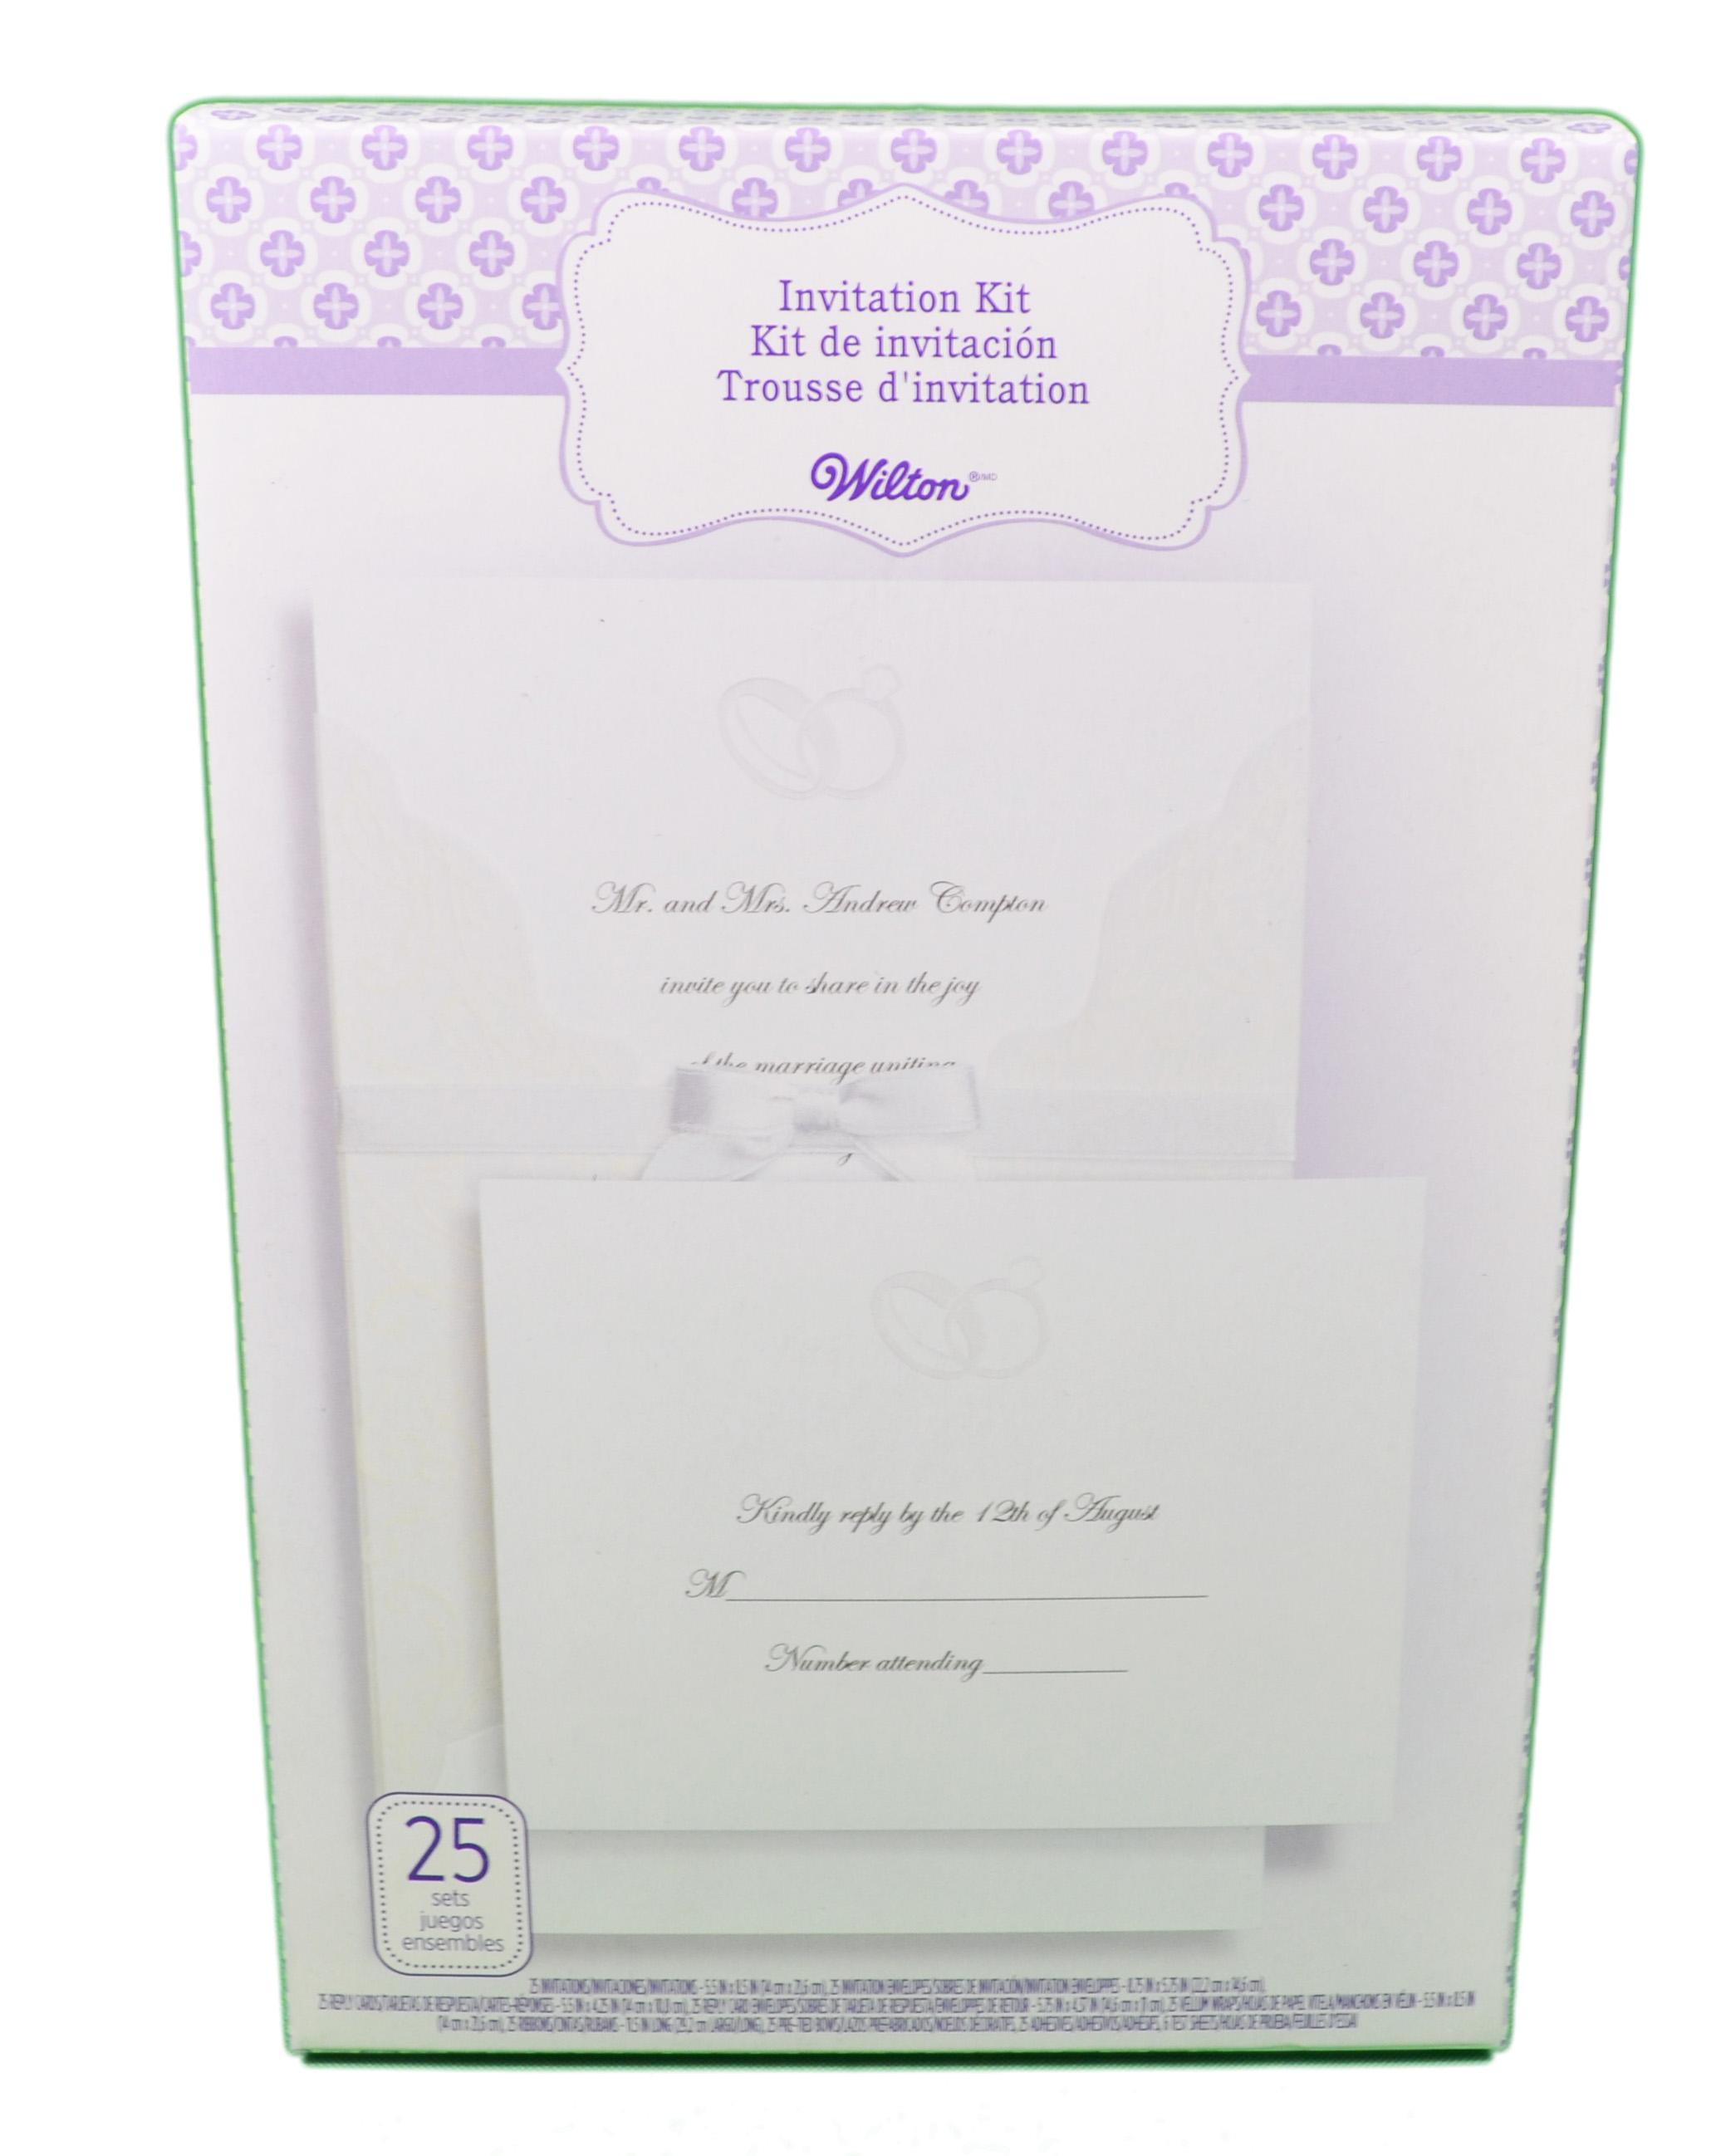 www wiltonprint com templates - wilton wedding invitation kit embellished rings 25 count